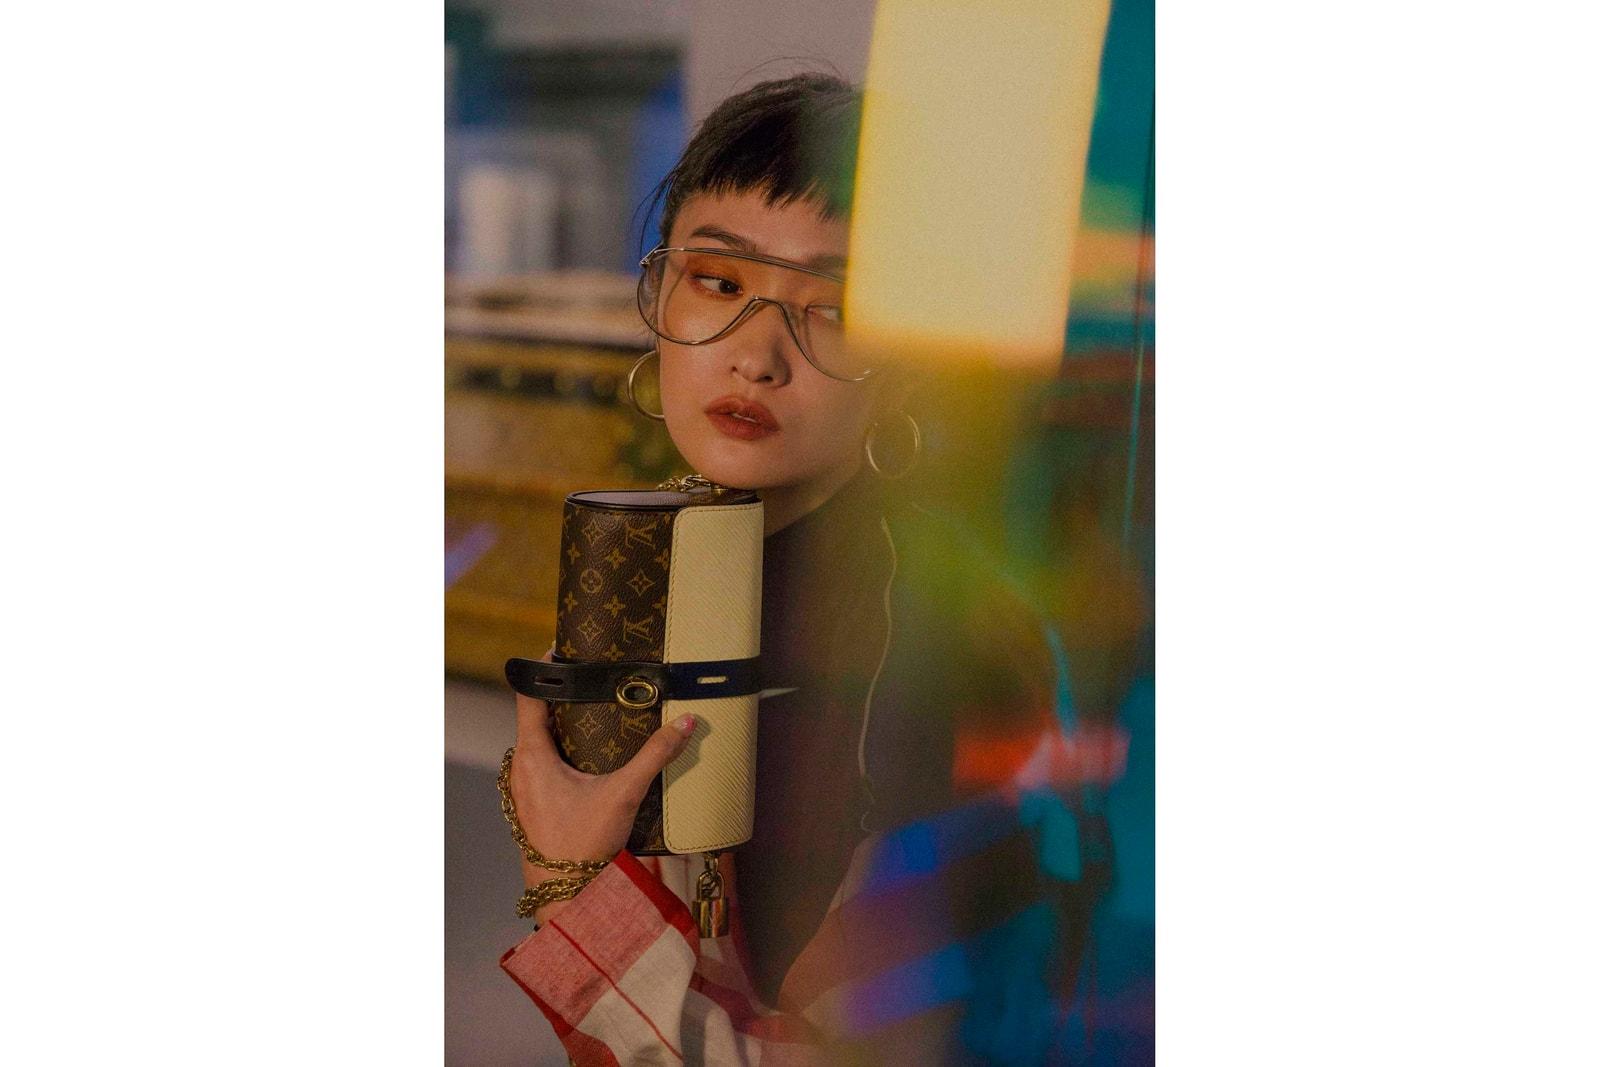 Louis Vuitton 何以仍受年輕人喜愛?專訪四位台灣次世代